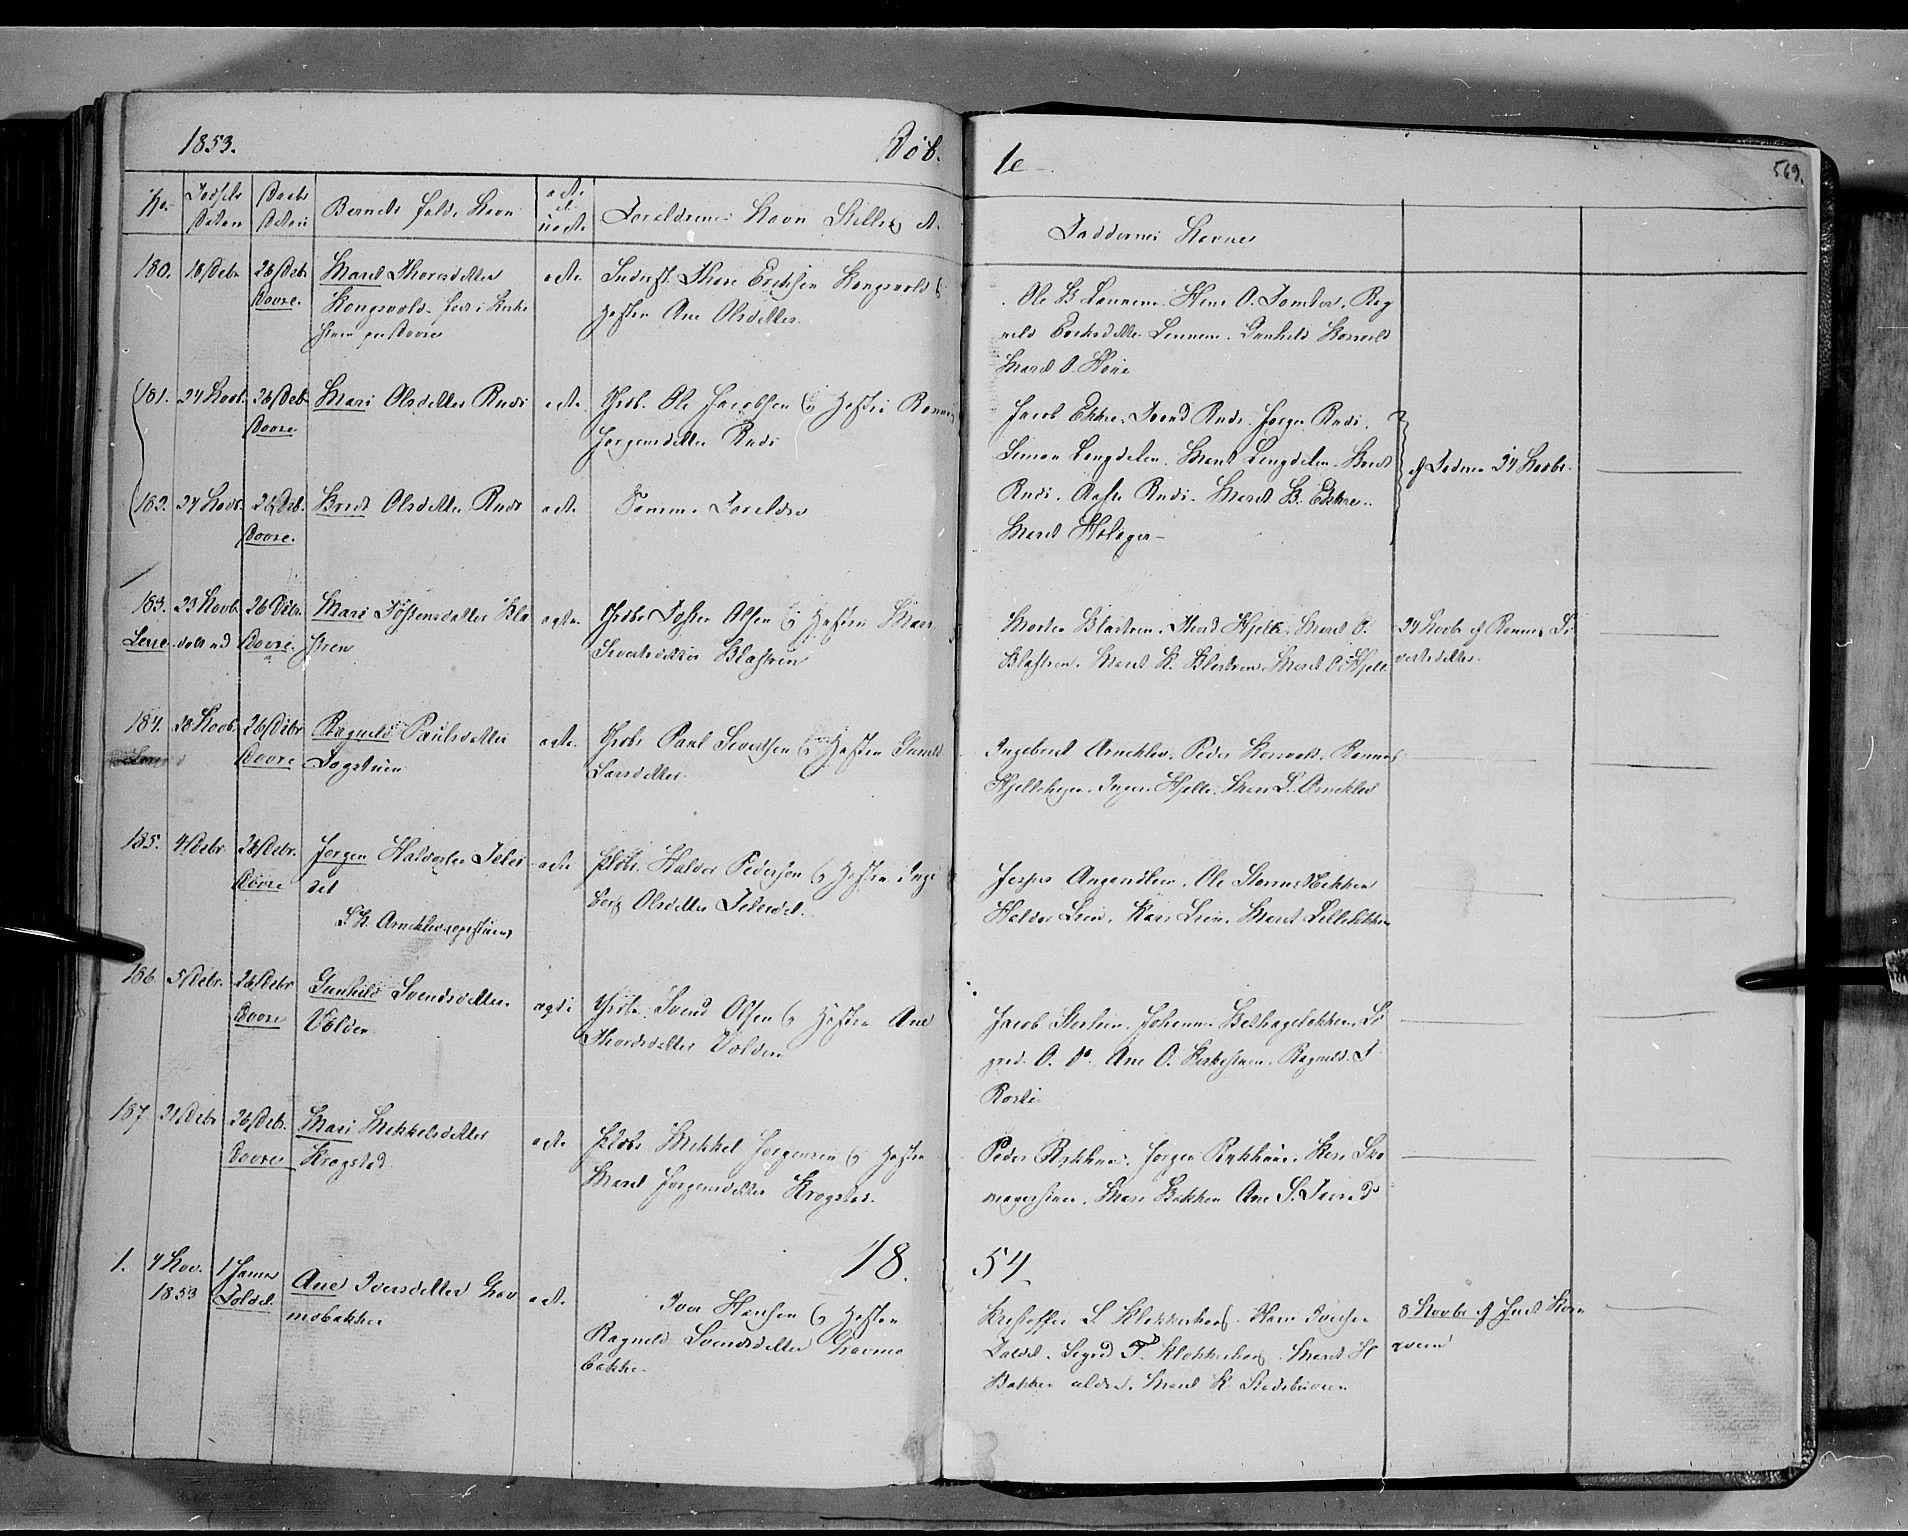 SAH, Lesja prestekontor, Ministerialbok nr. 6B, 1843-1854, s. 569